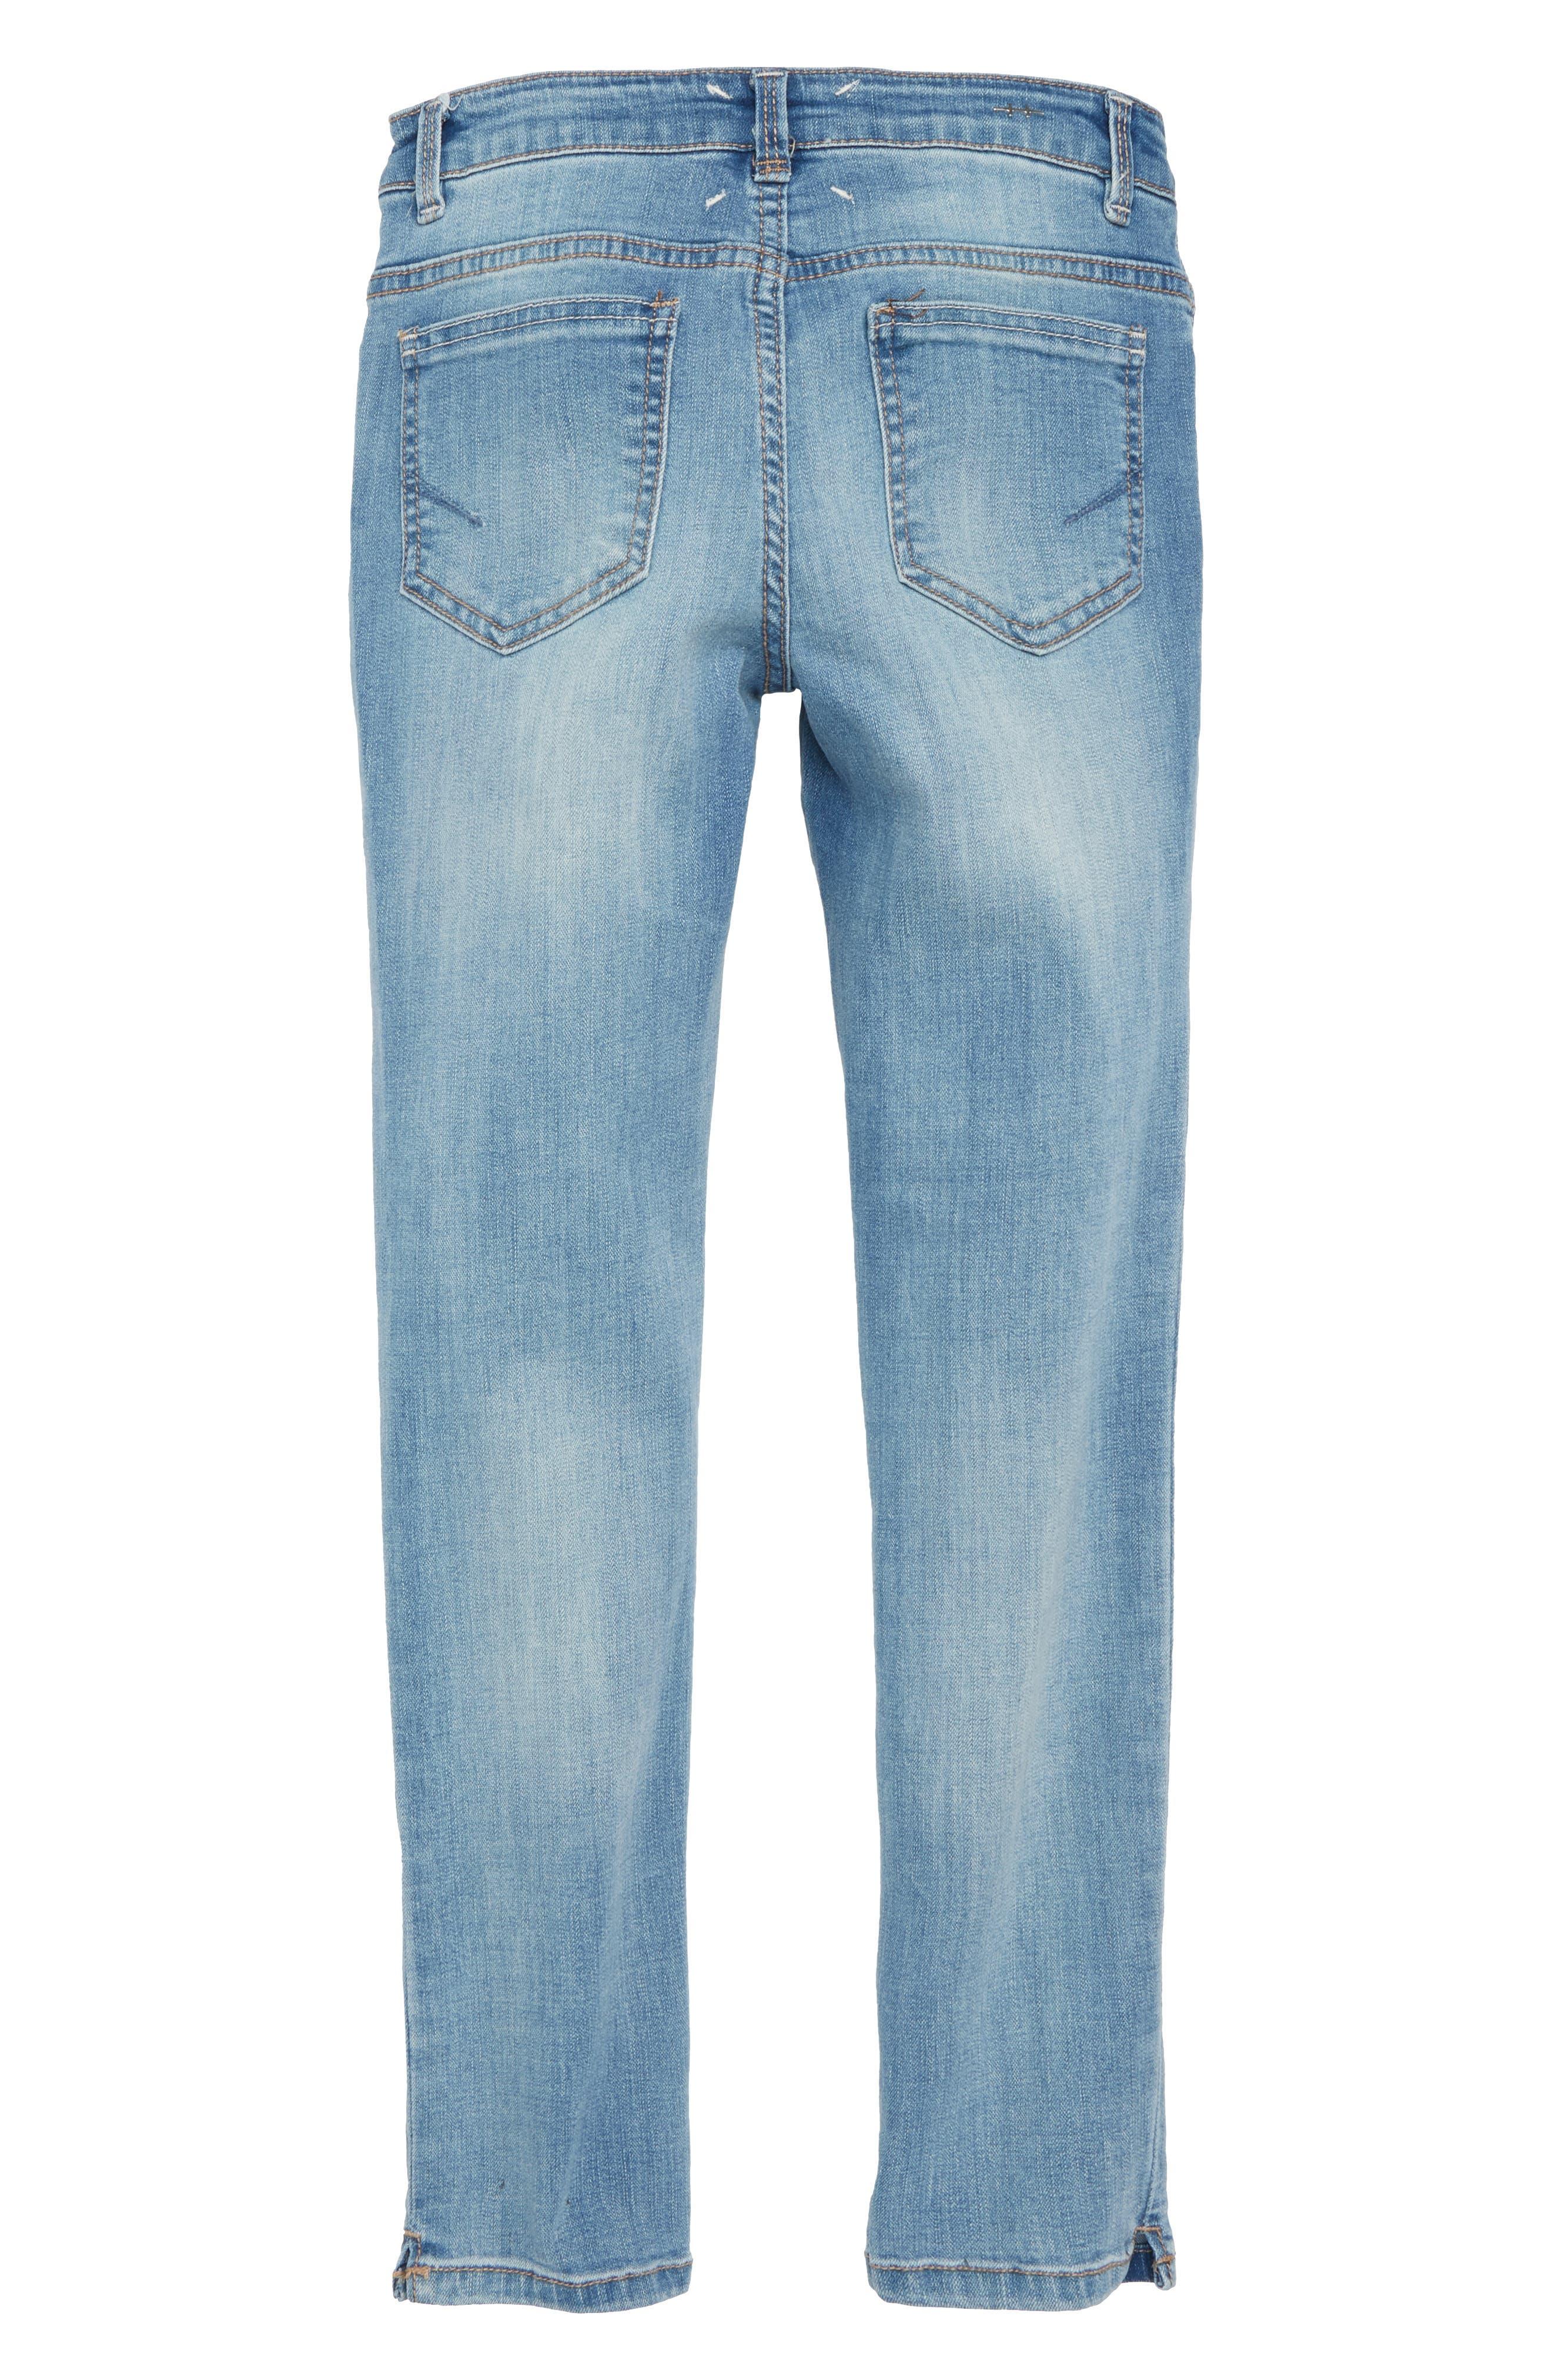 Skinny Jeans,                             Alternate thumbnail 2, color,                             Light Stone